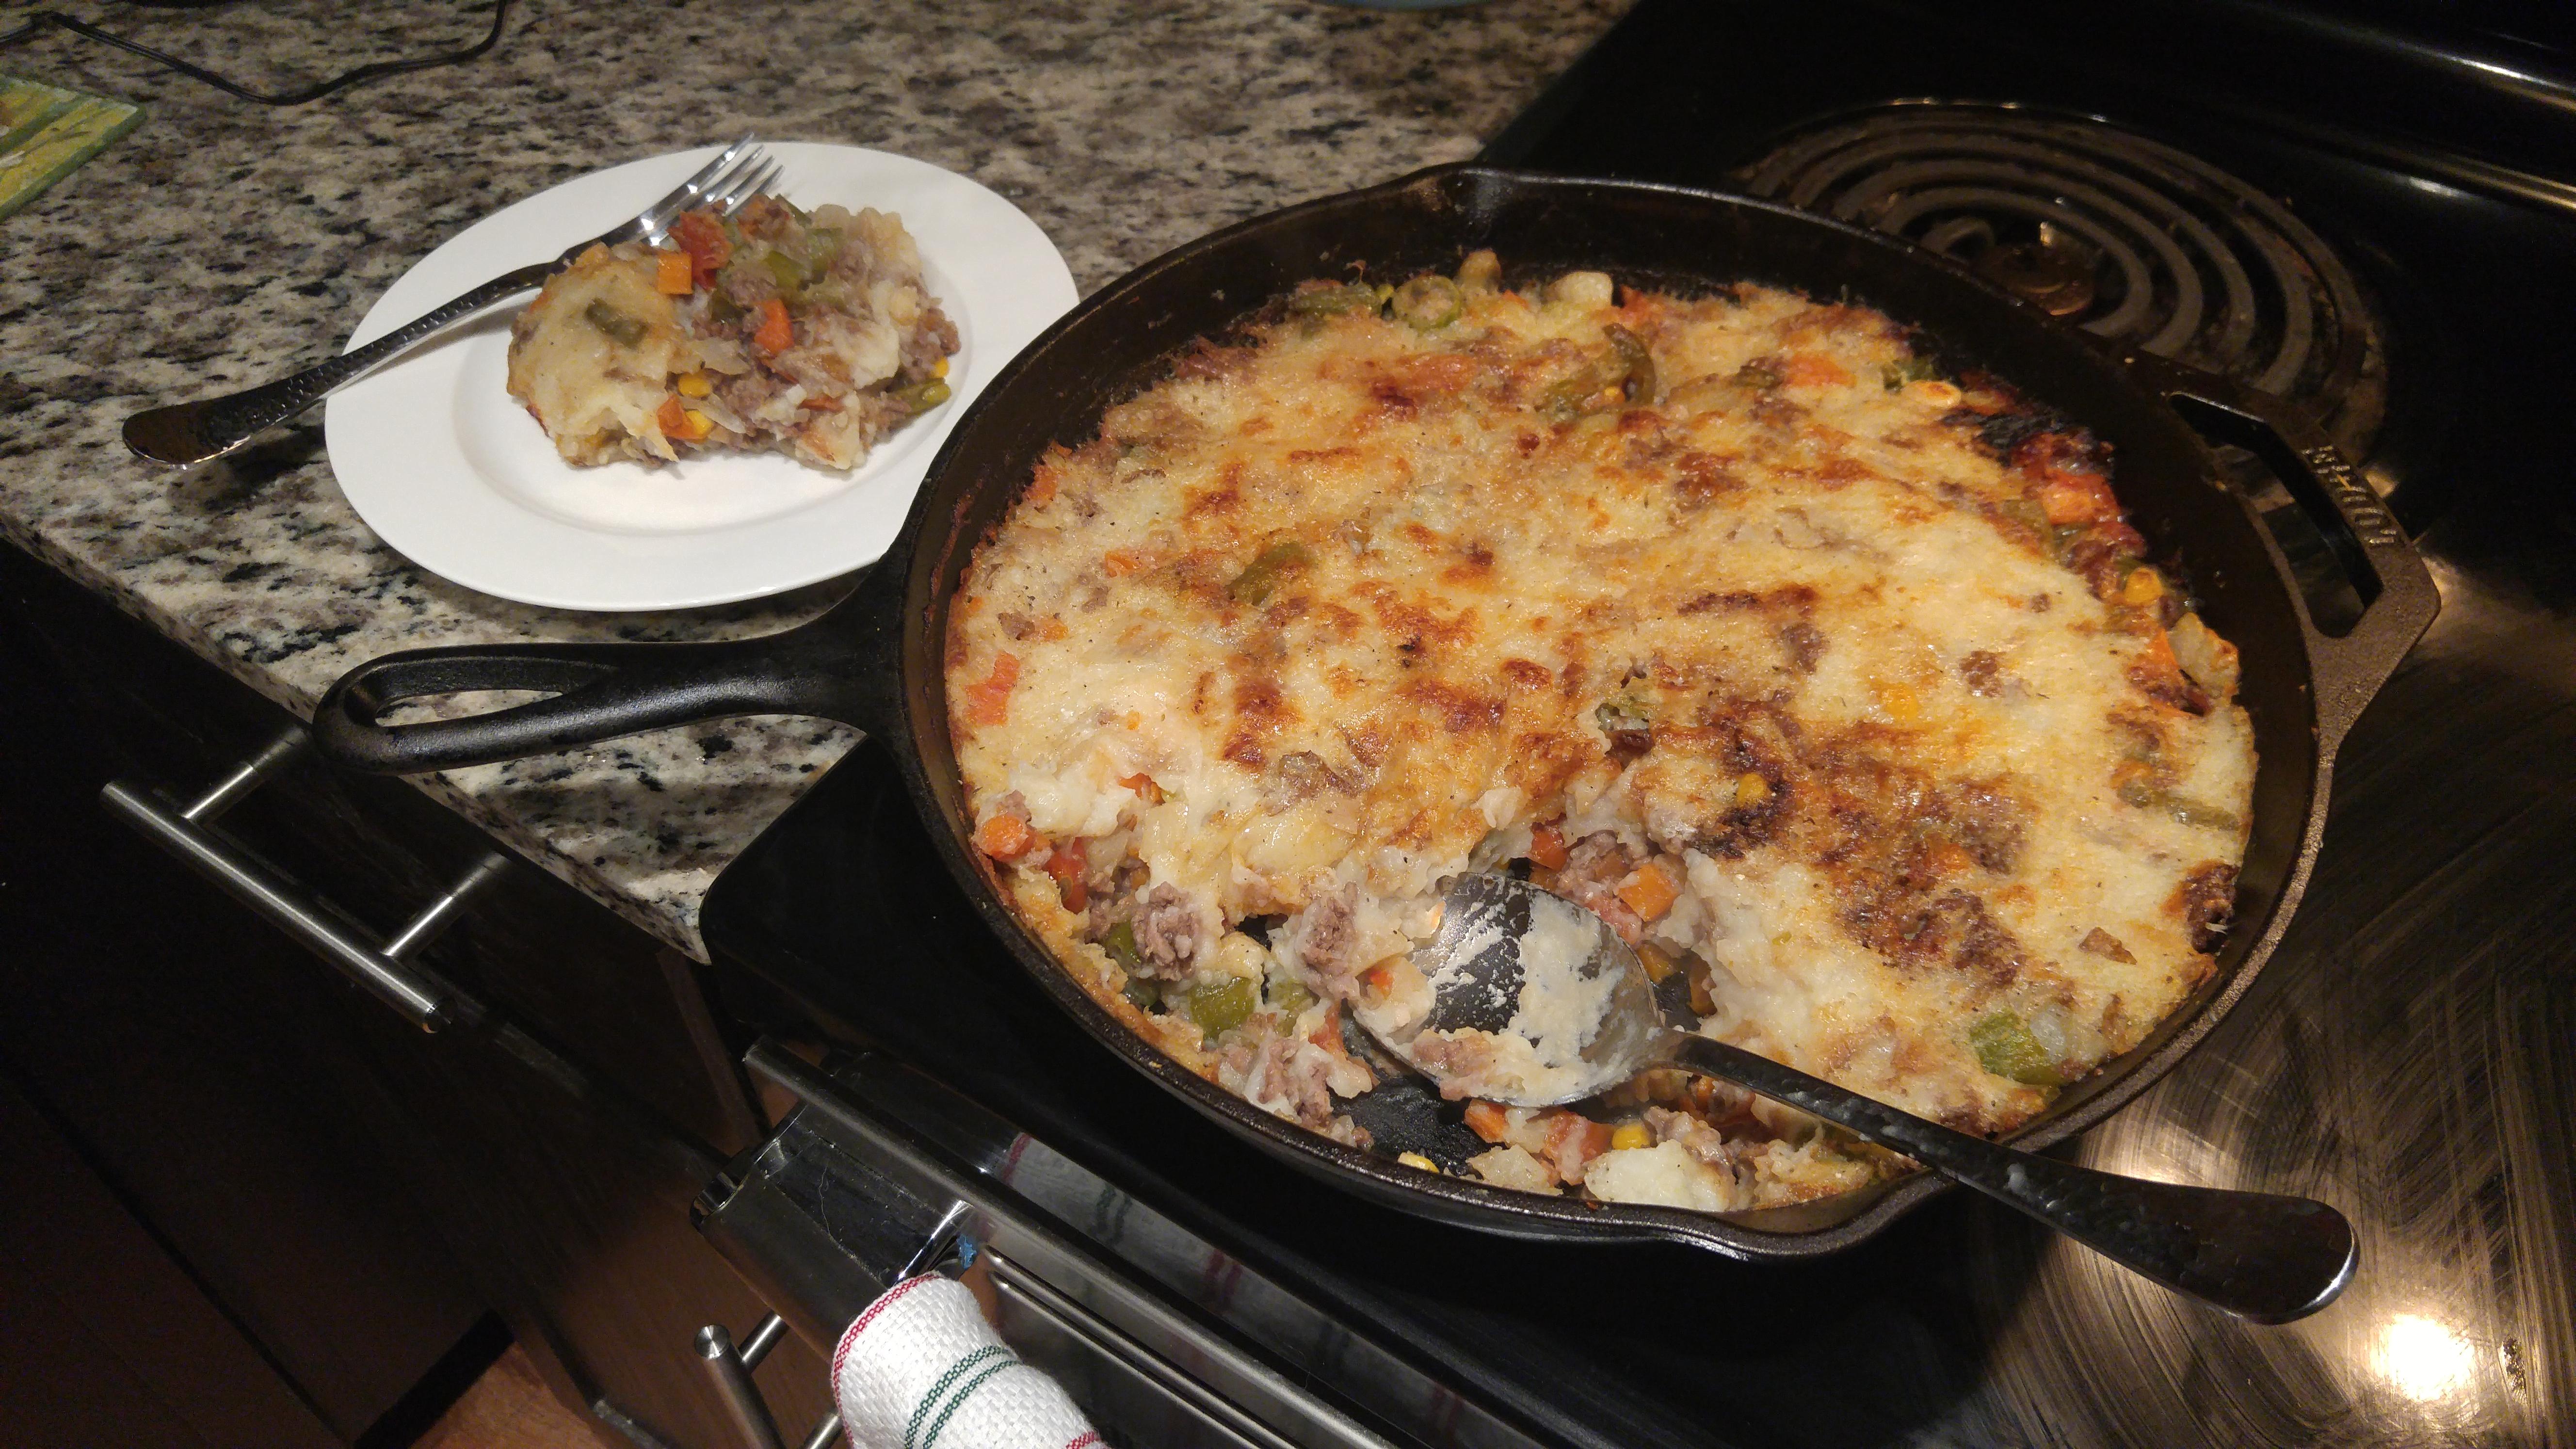 Parmesan Shepherd's Pie – Cast Iron SkilletStyle